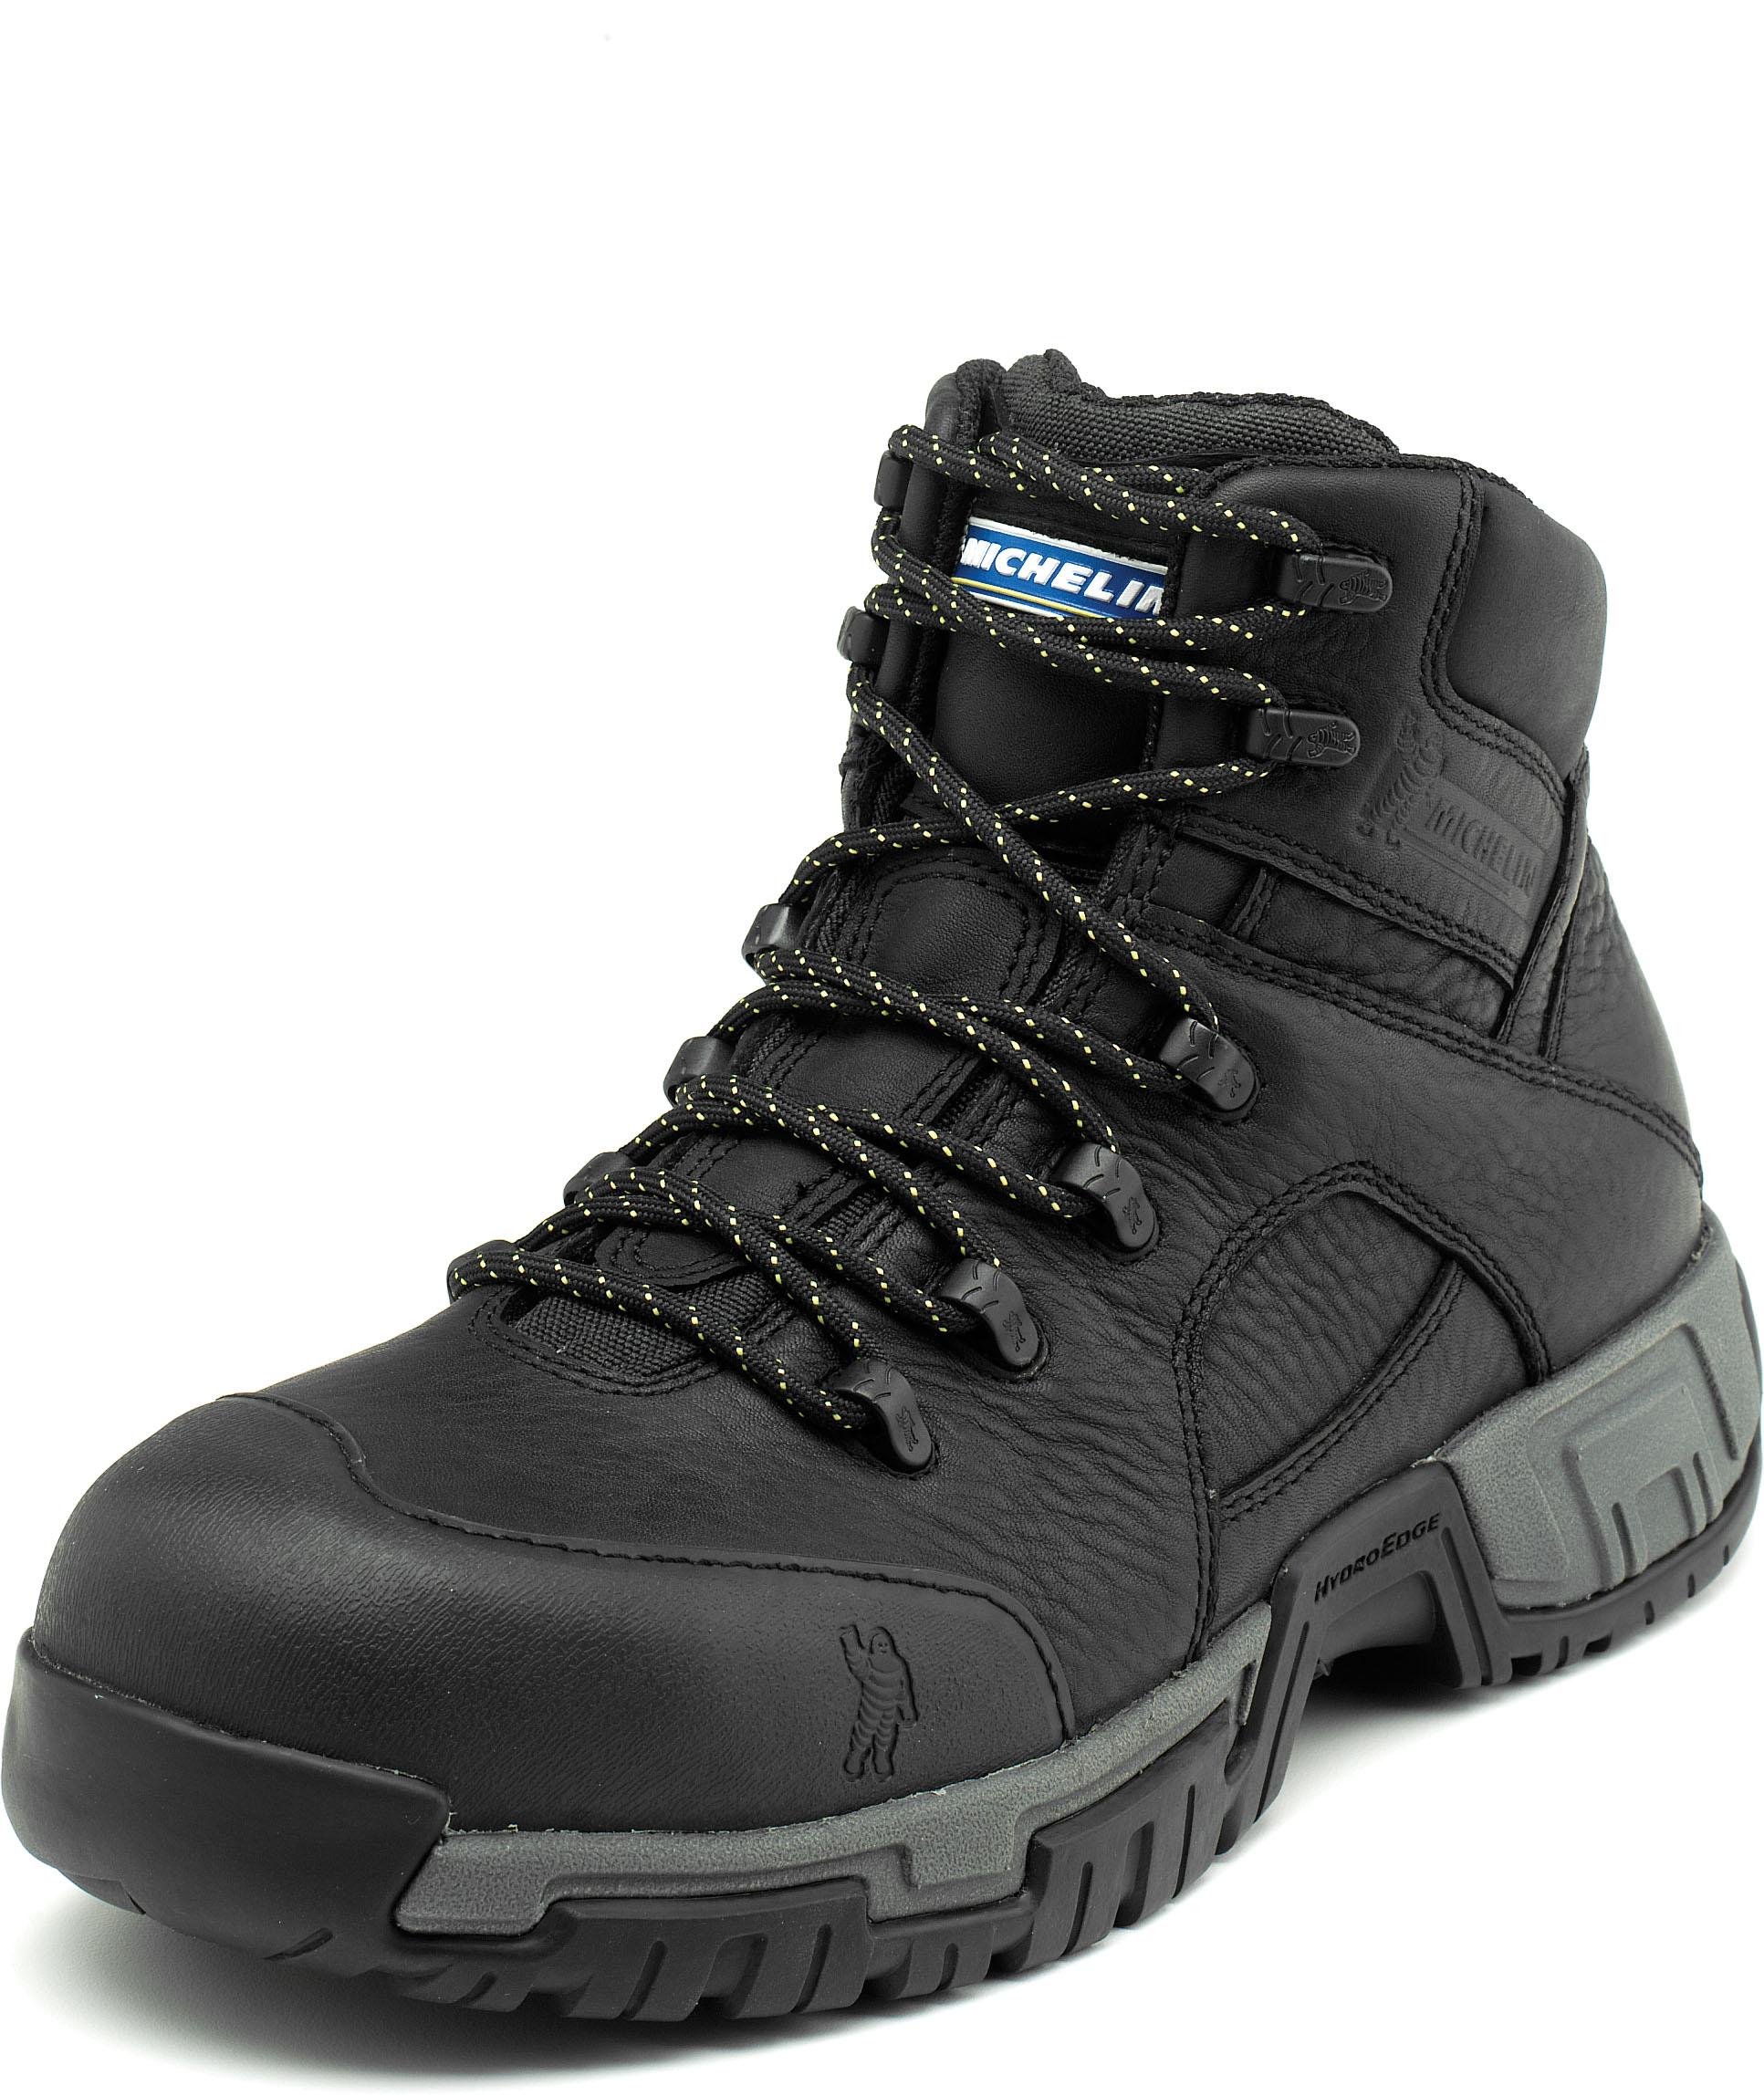 Michelin HydroEdge 6 Work Boot XHY866